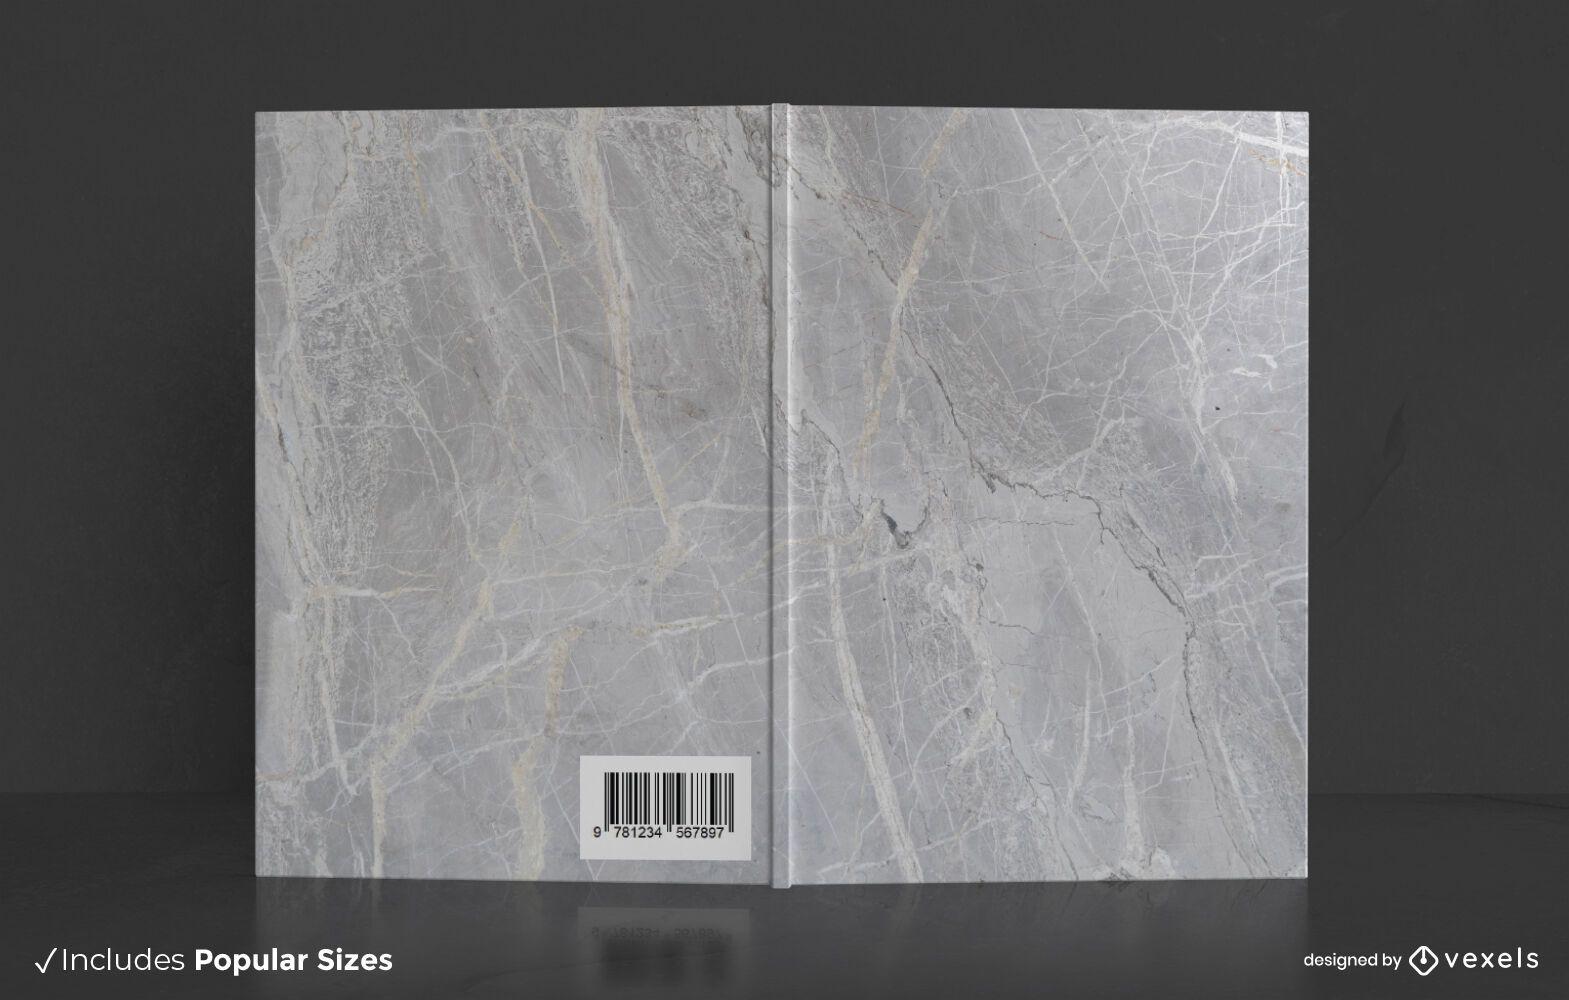 Diseño de portada de libro de mármol